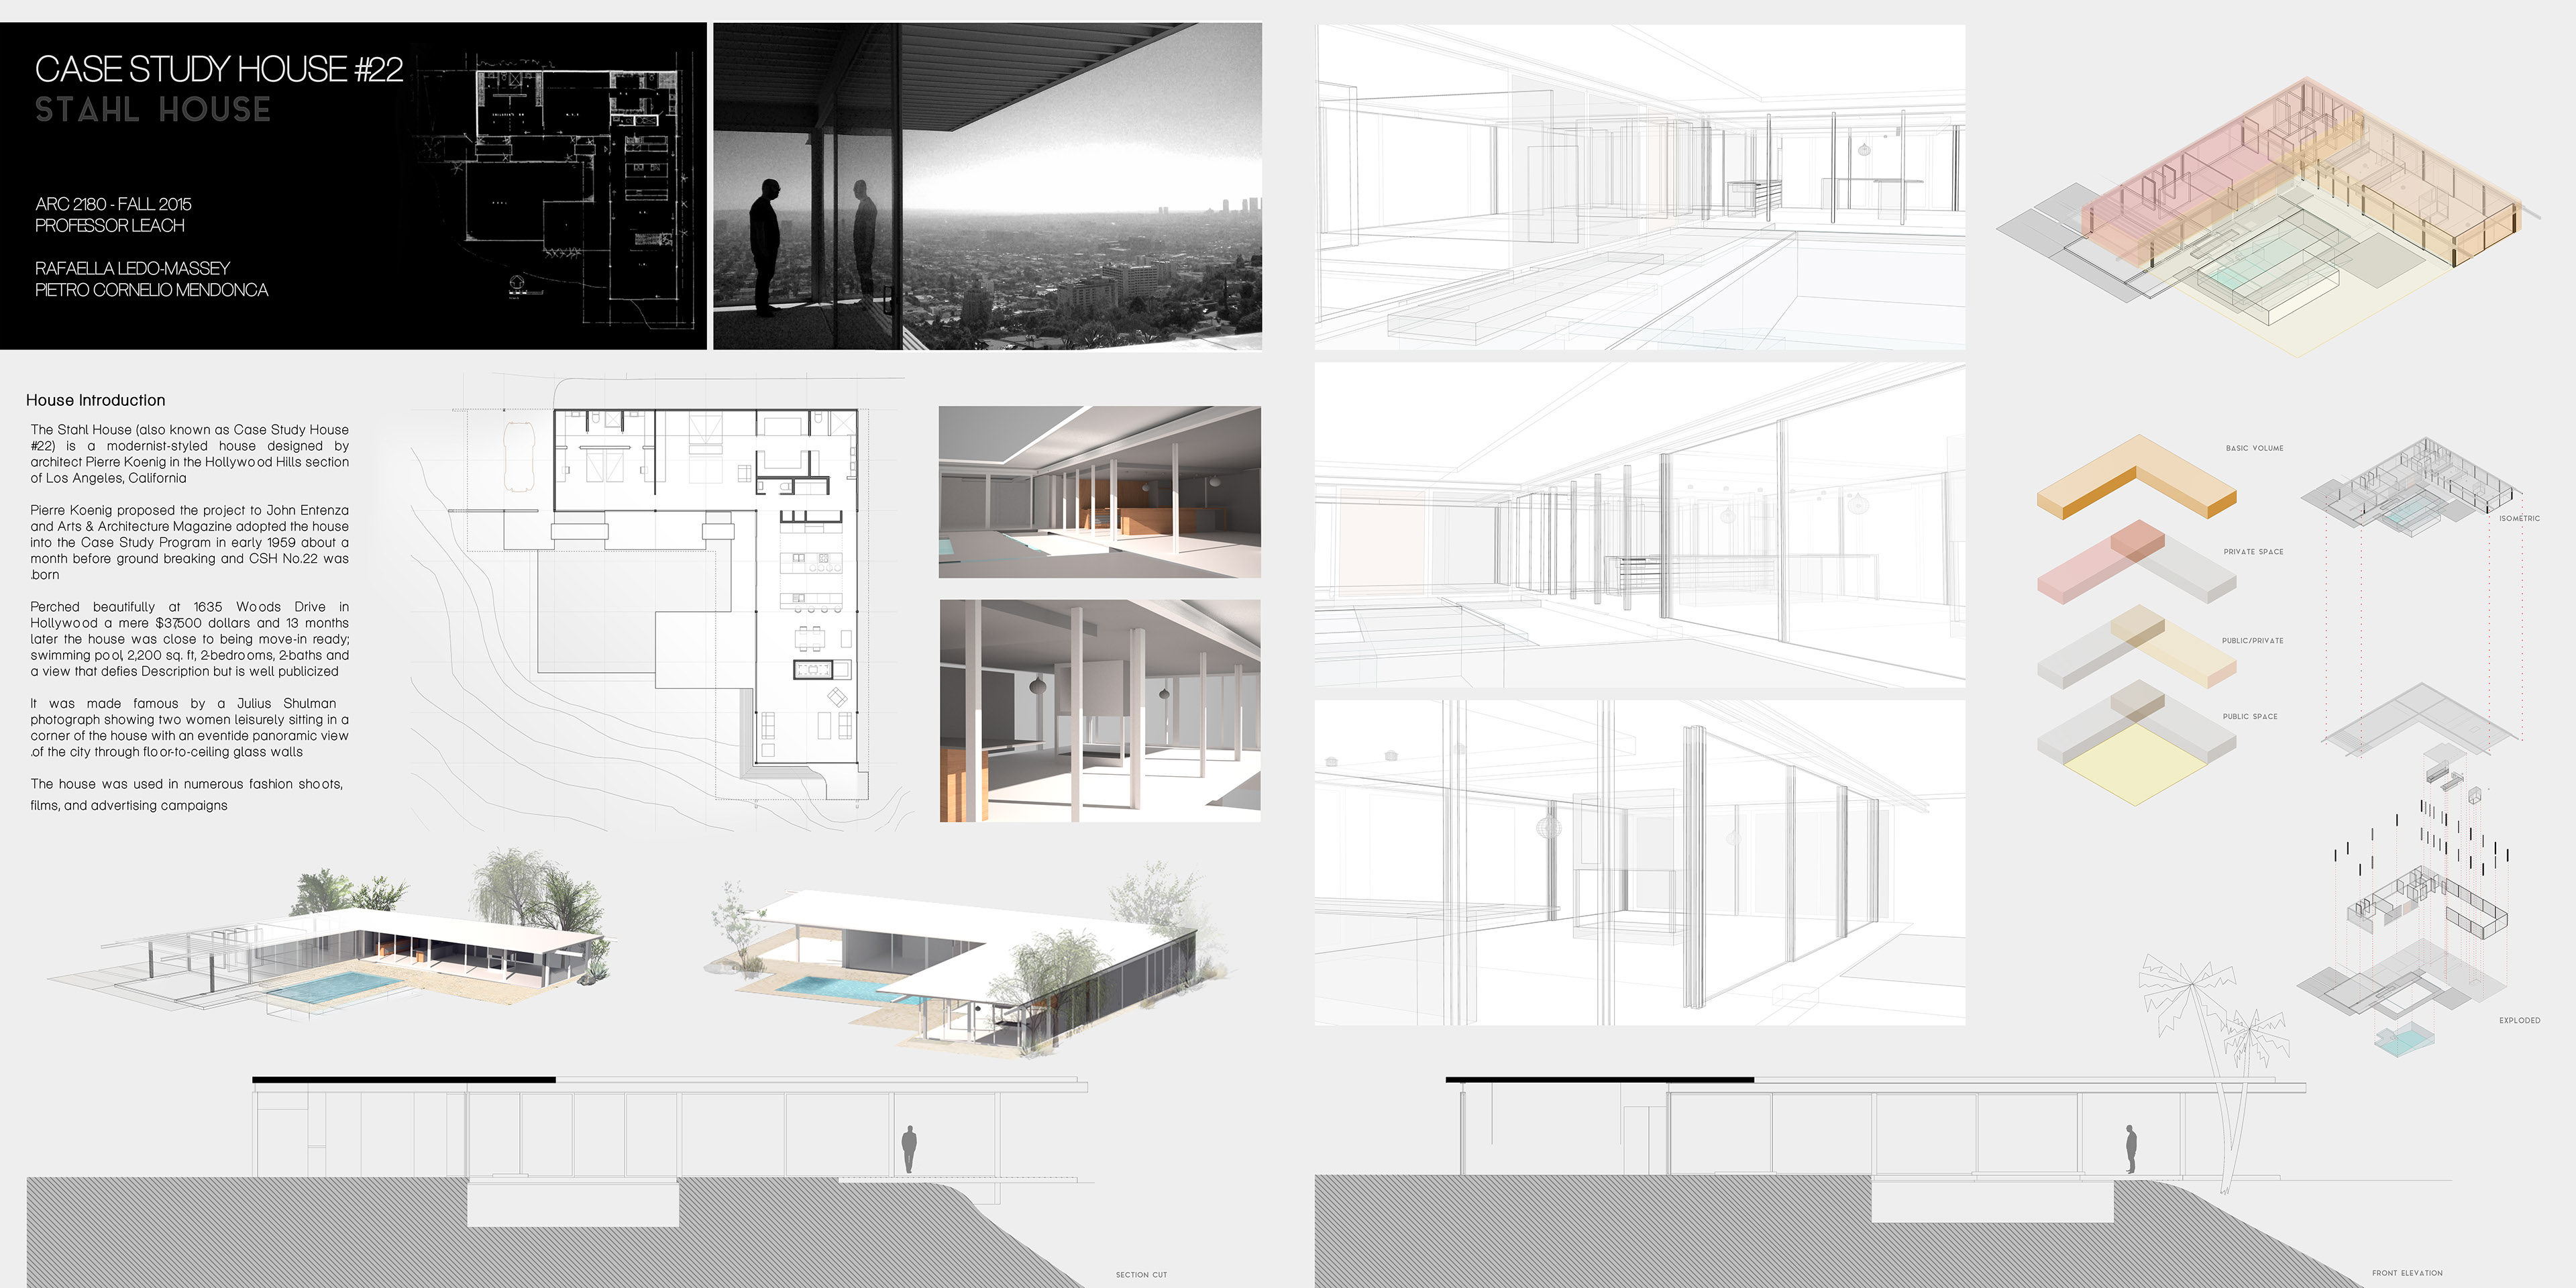 Surprising Stahl House Floor Plan Images - Best Ideas Exterior ...